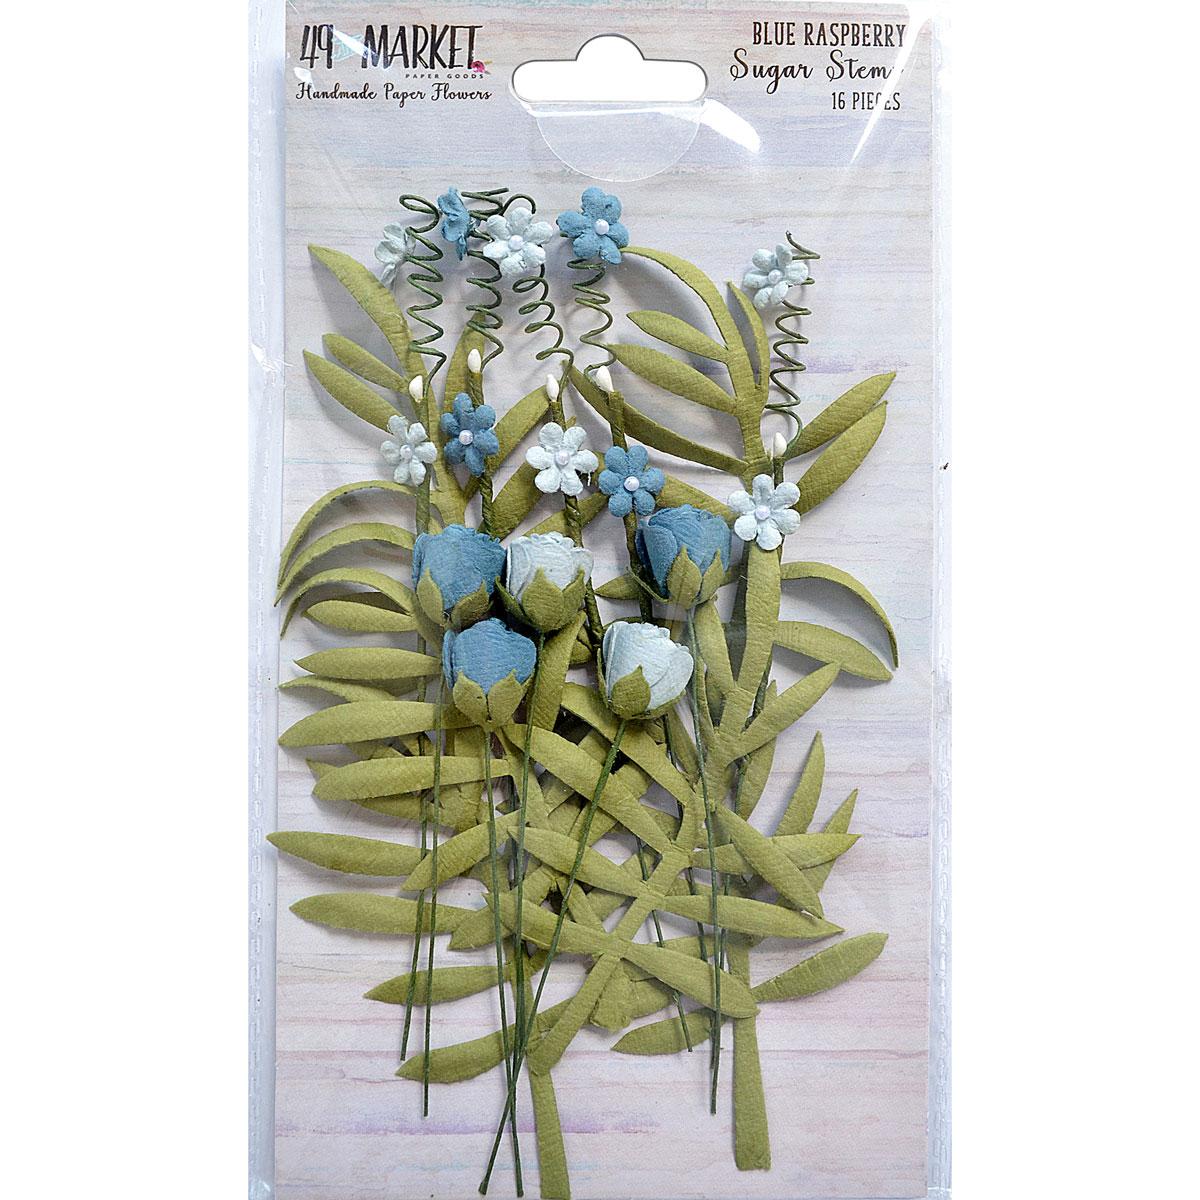 49 and Market - Sugar Stems (Blue Raspberry)